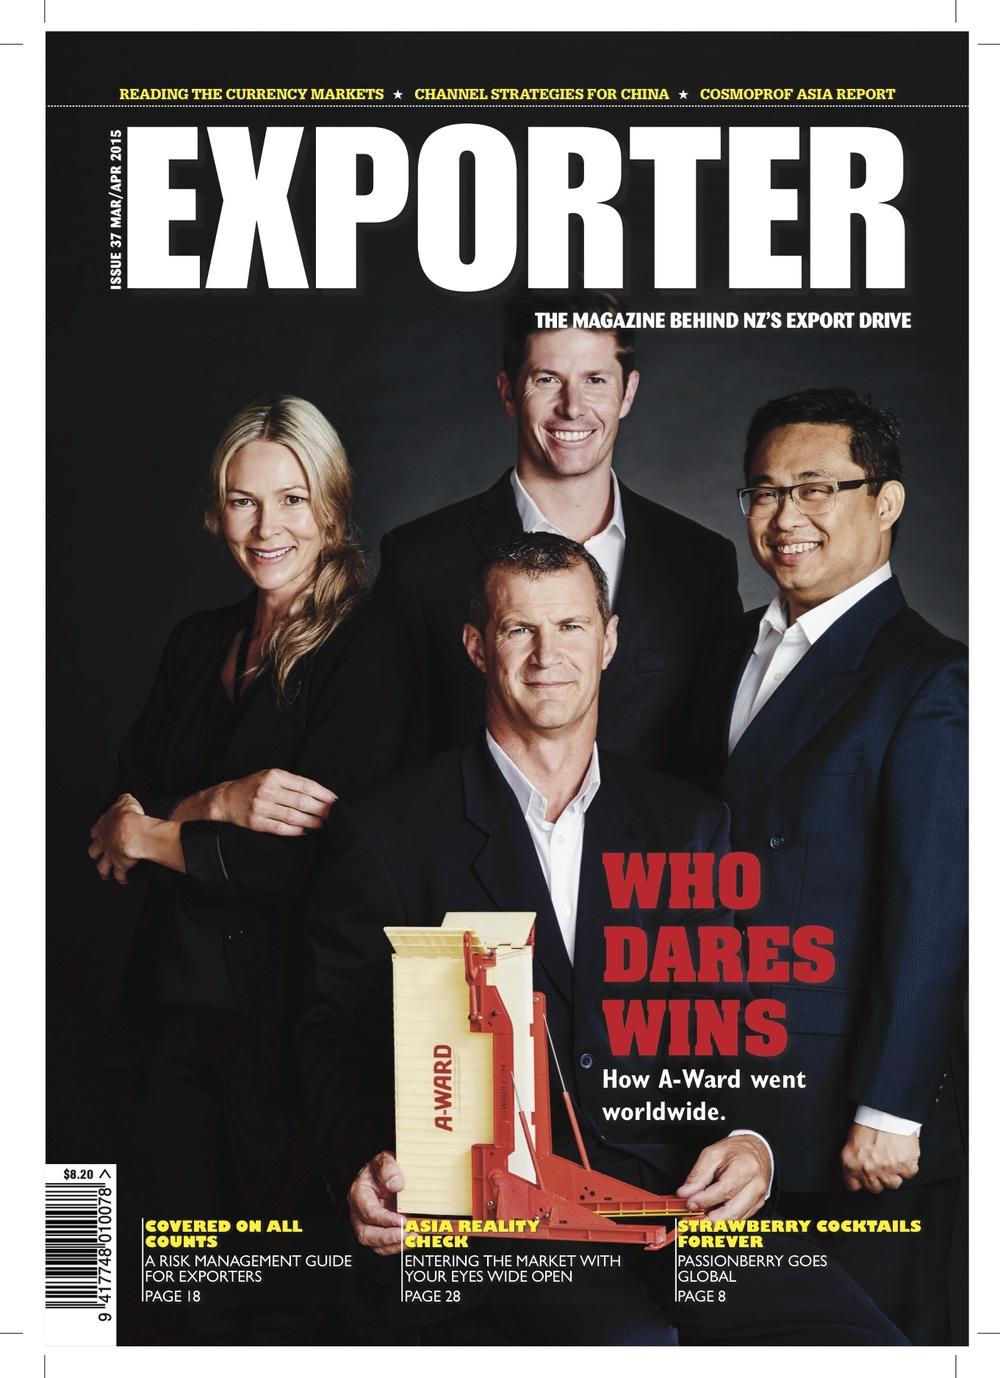 Exporter Cover April 2015.jpg